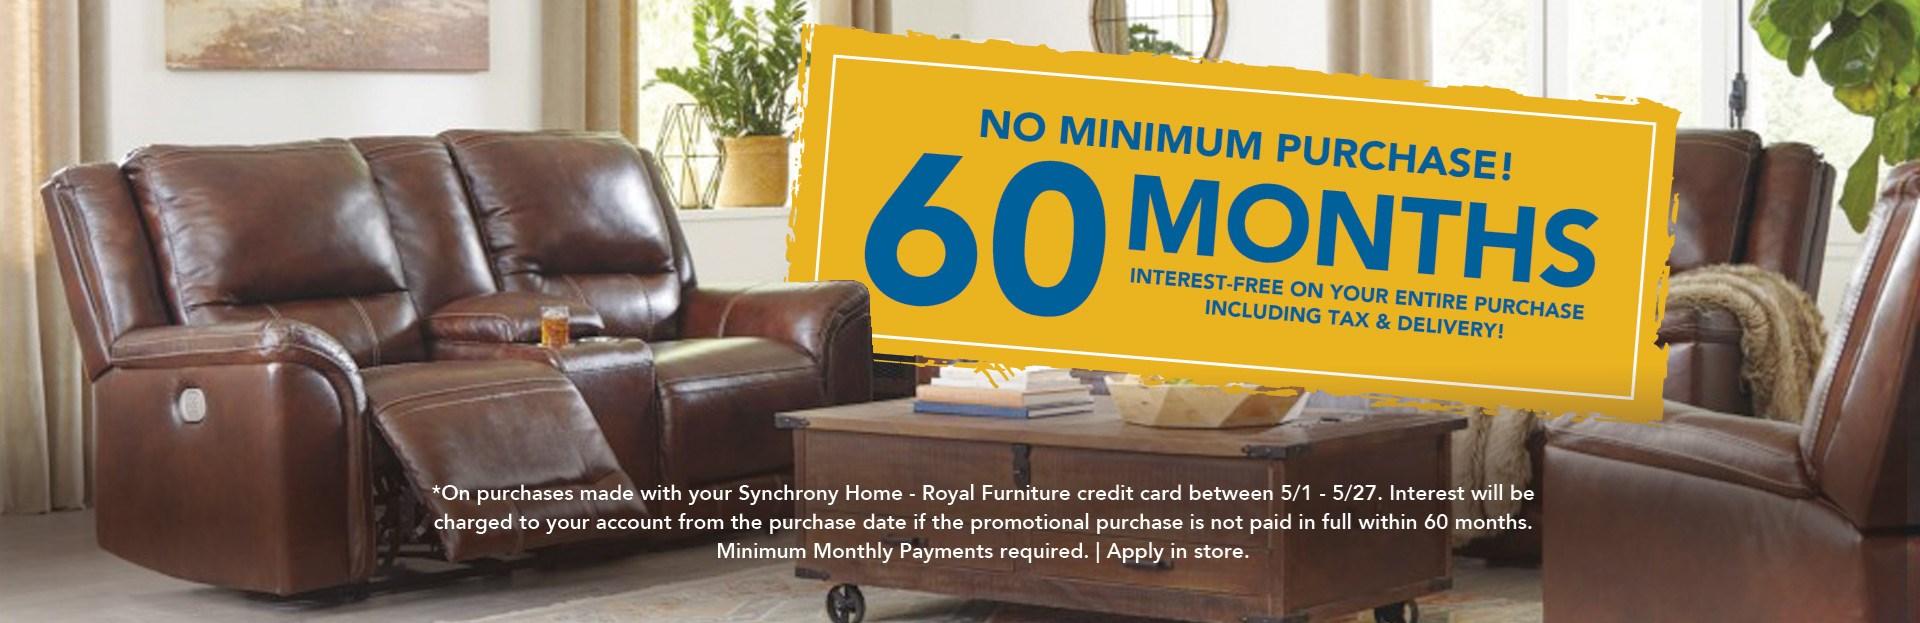 60 MONTHS INTEREST FREE FURNITURE FINANCING